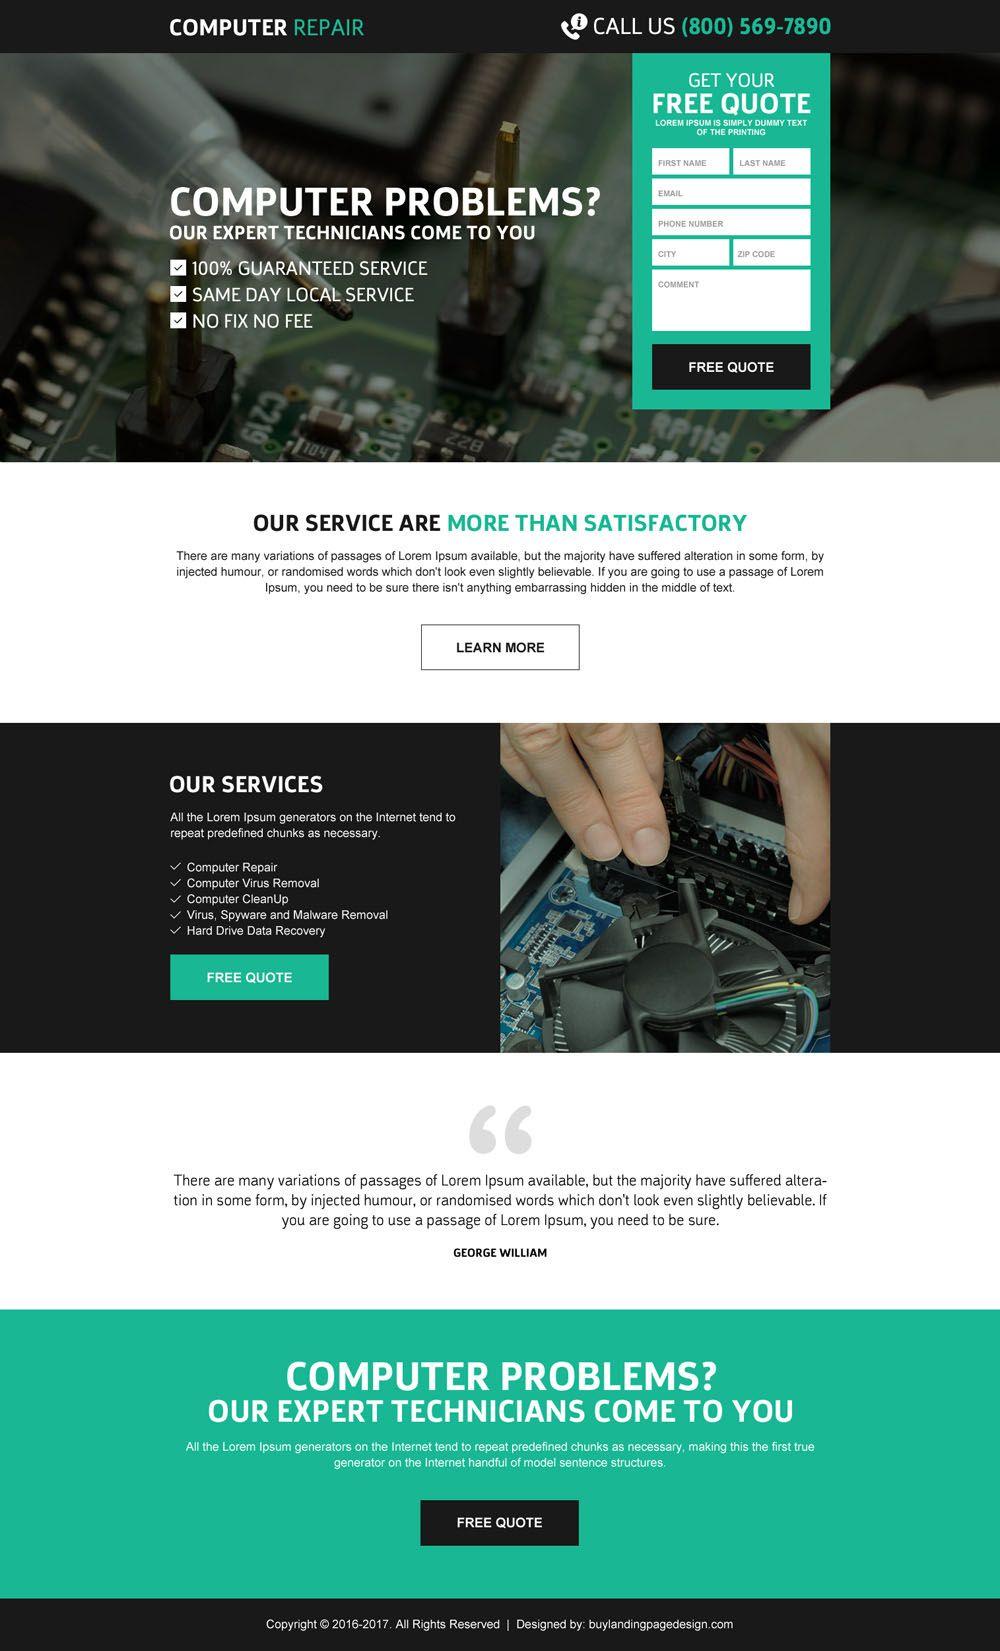 Computer Repair Service Effective Free Quote Lead Gen Responsive